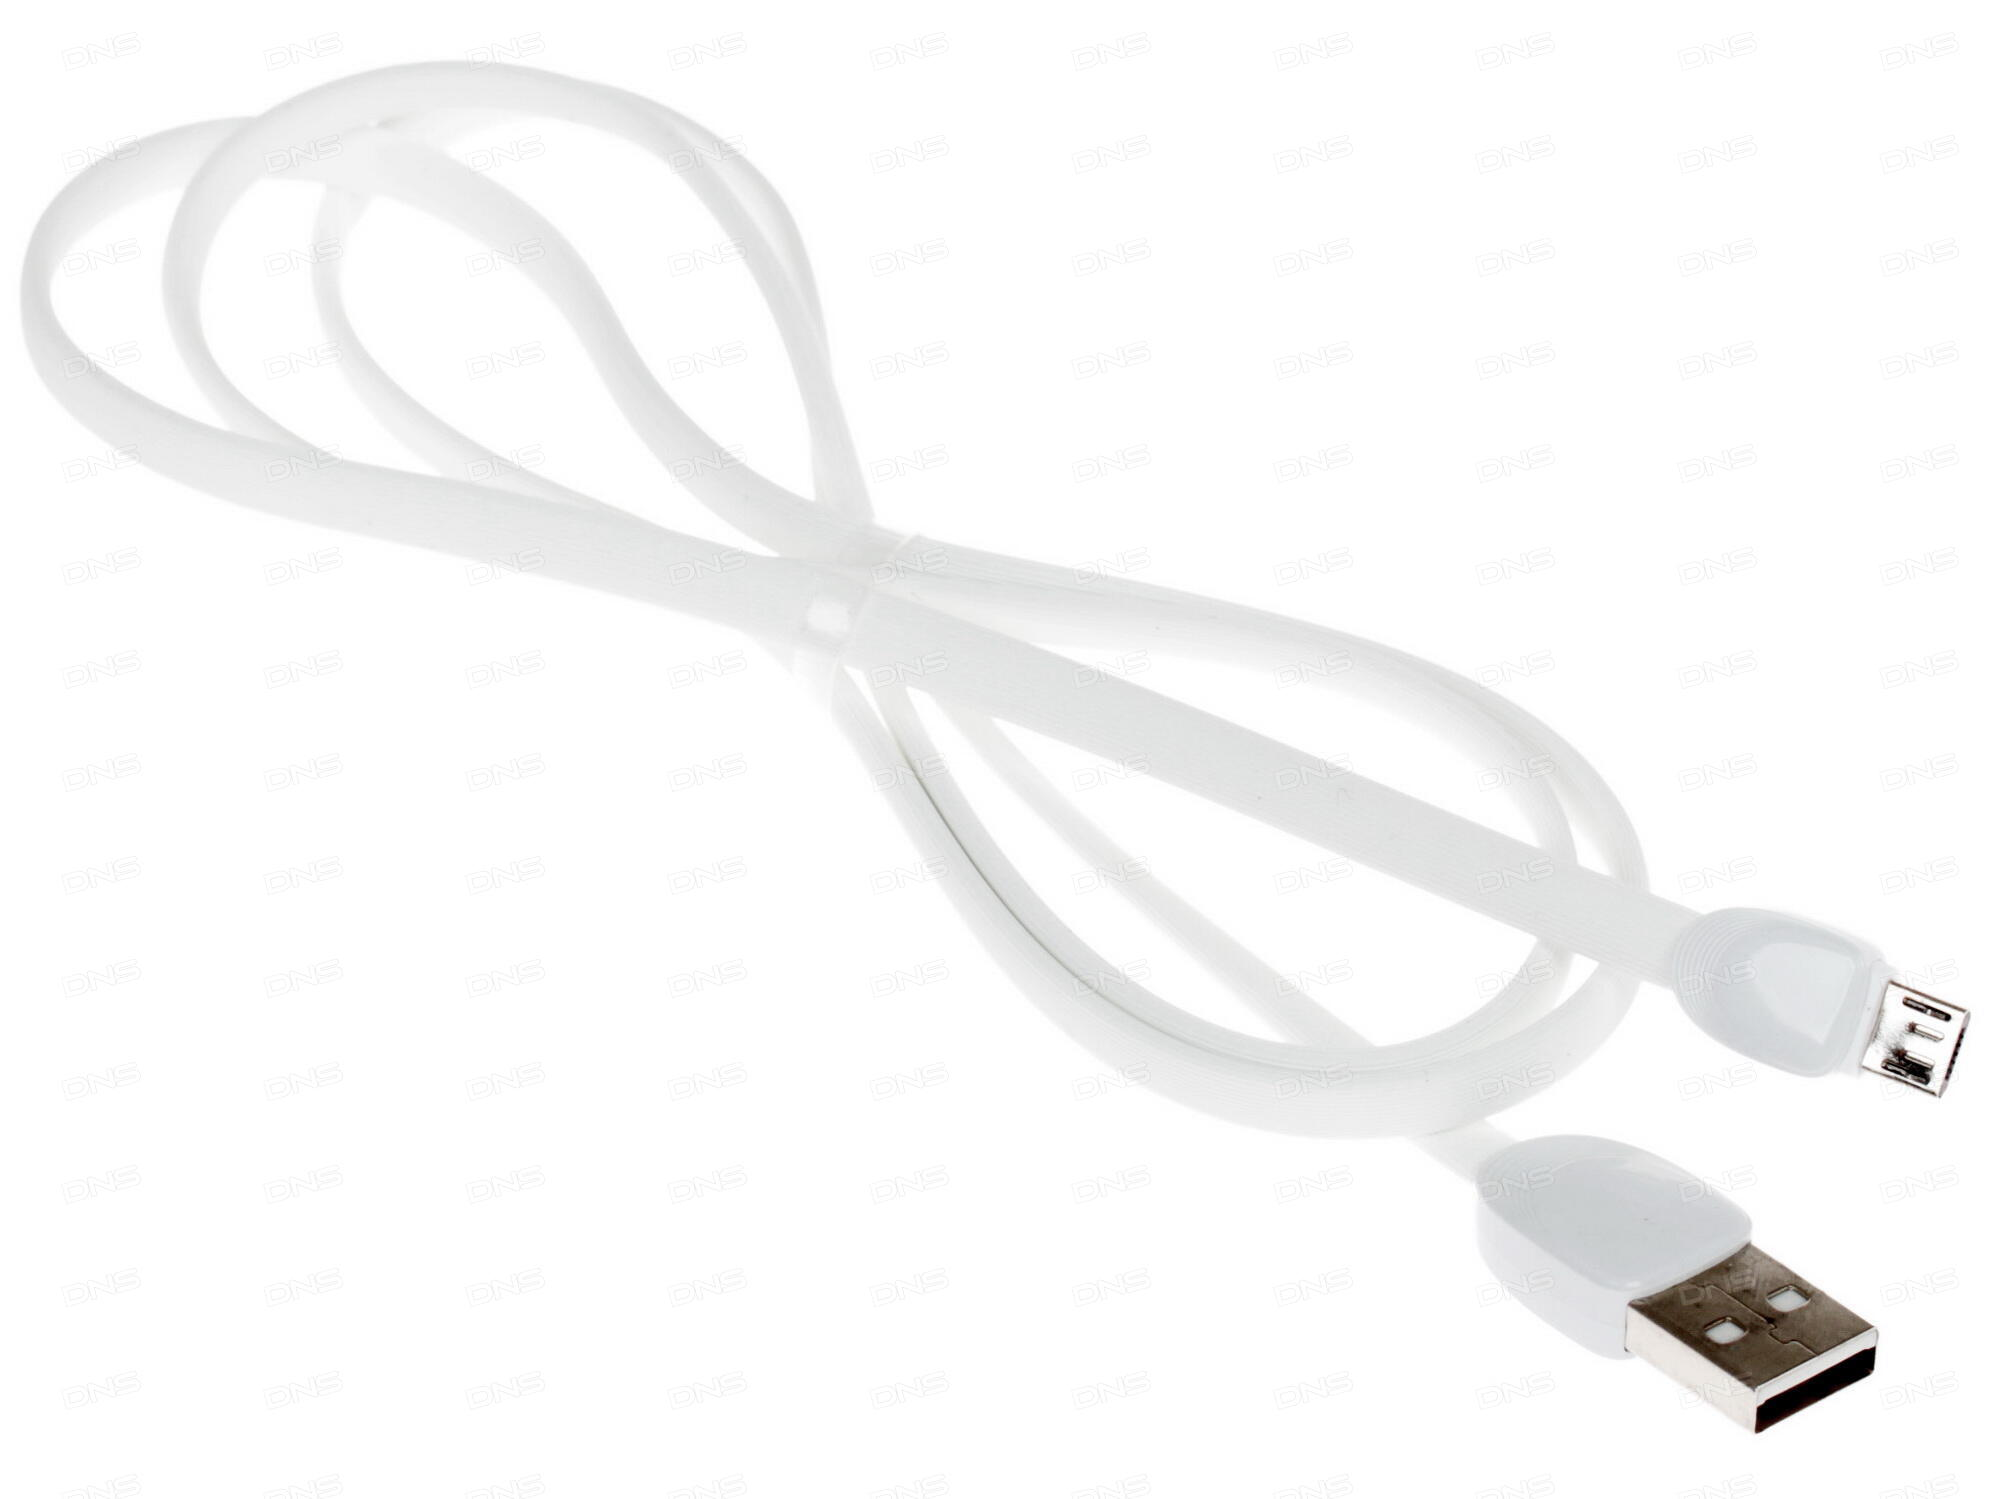 Кабель USB Cablexpert USB2.0 microBM/USB3.1 Type C 1м пакет